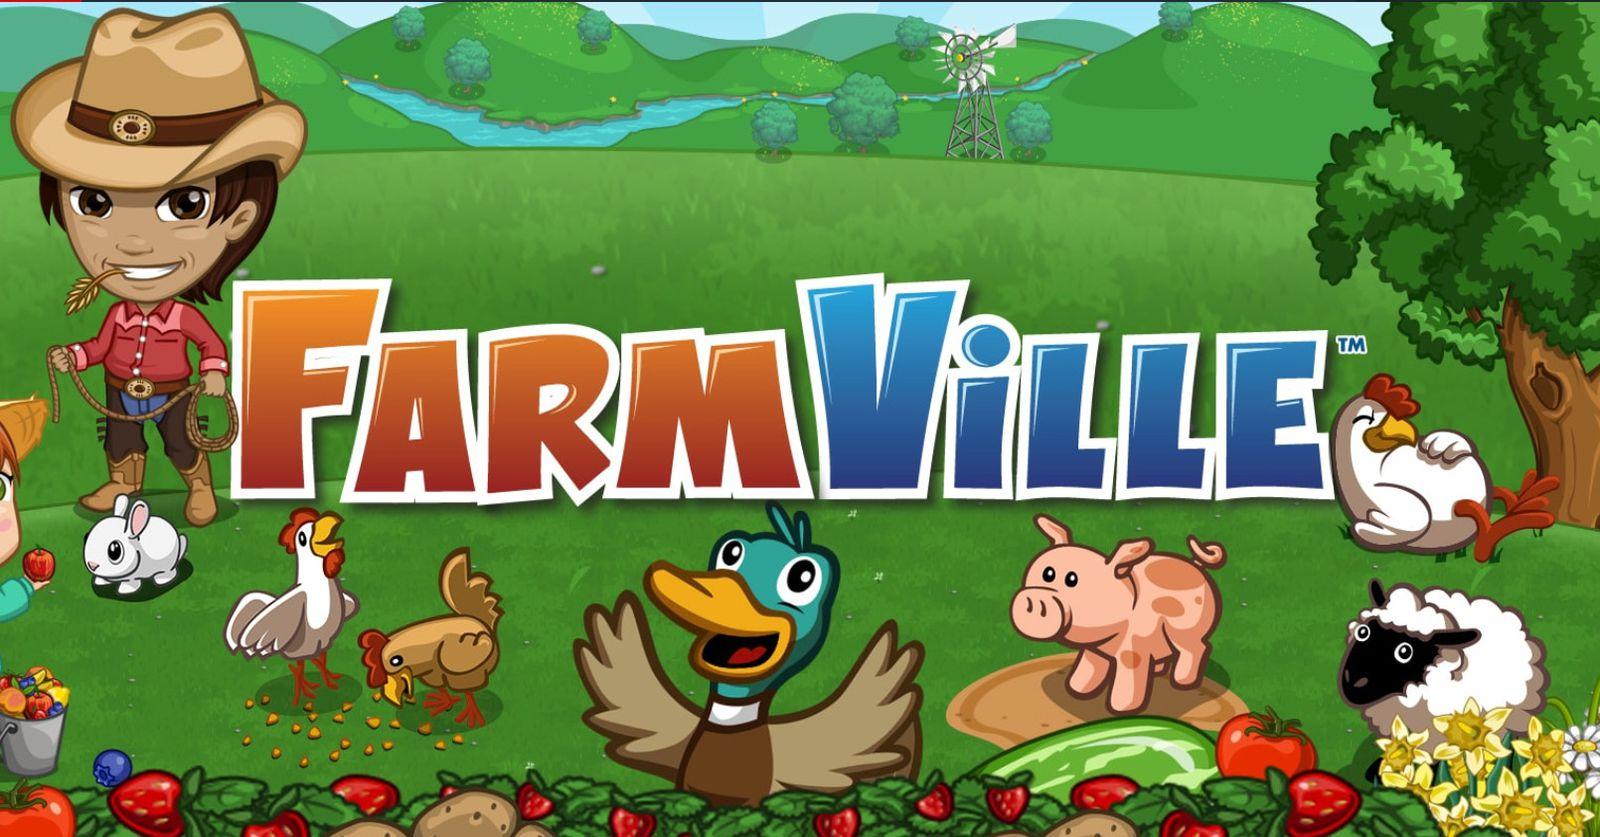 igra facebook farmville igranje facebook